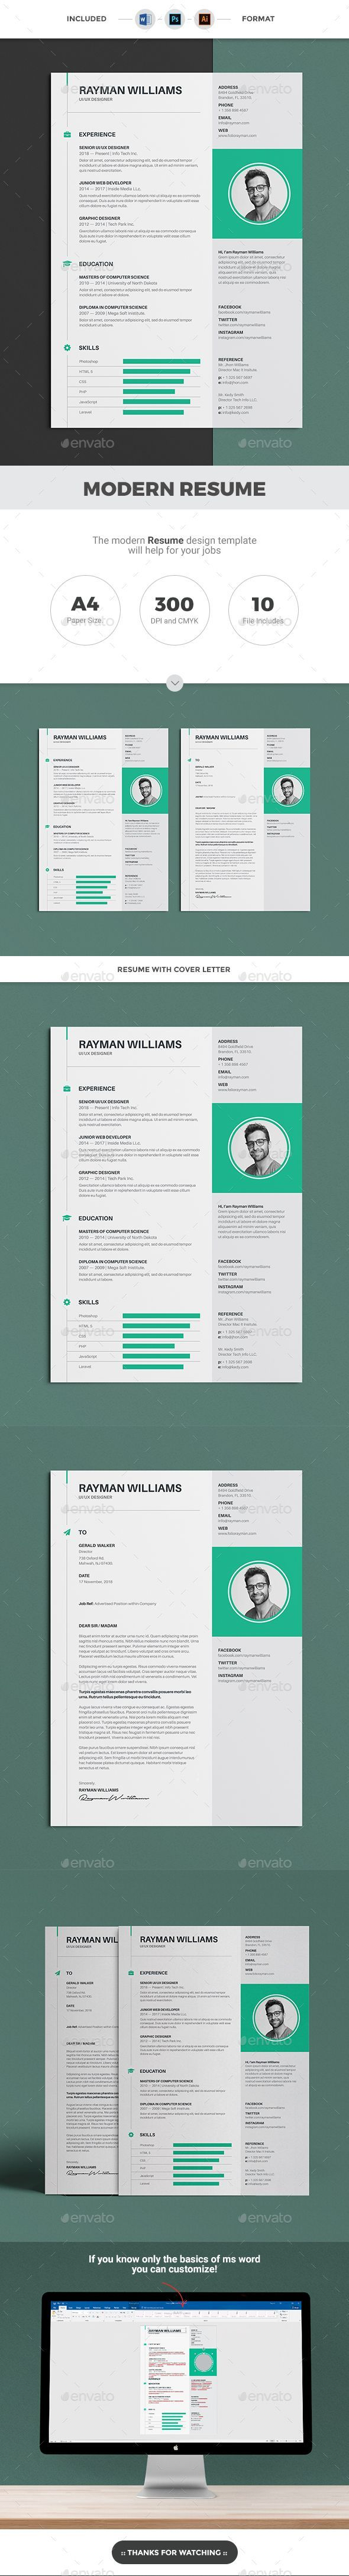 Modern u0026 clean resume design template help